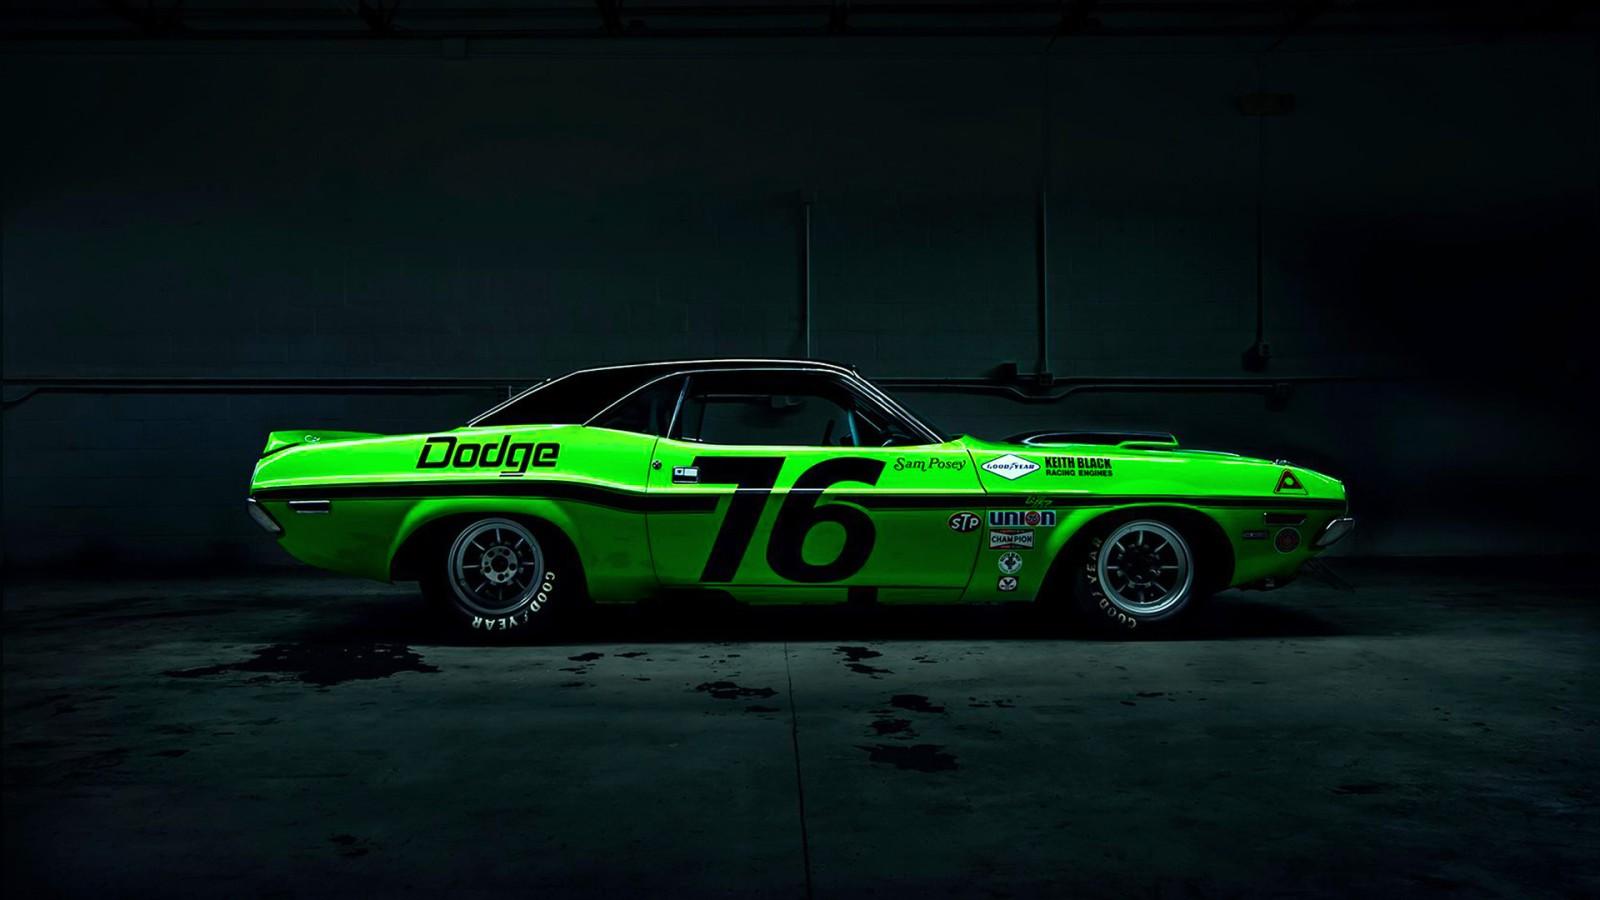 Dodge Challenger Drag Racing Wallpaper Hd Car Wallpapers